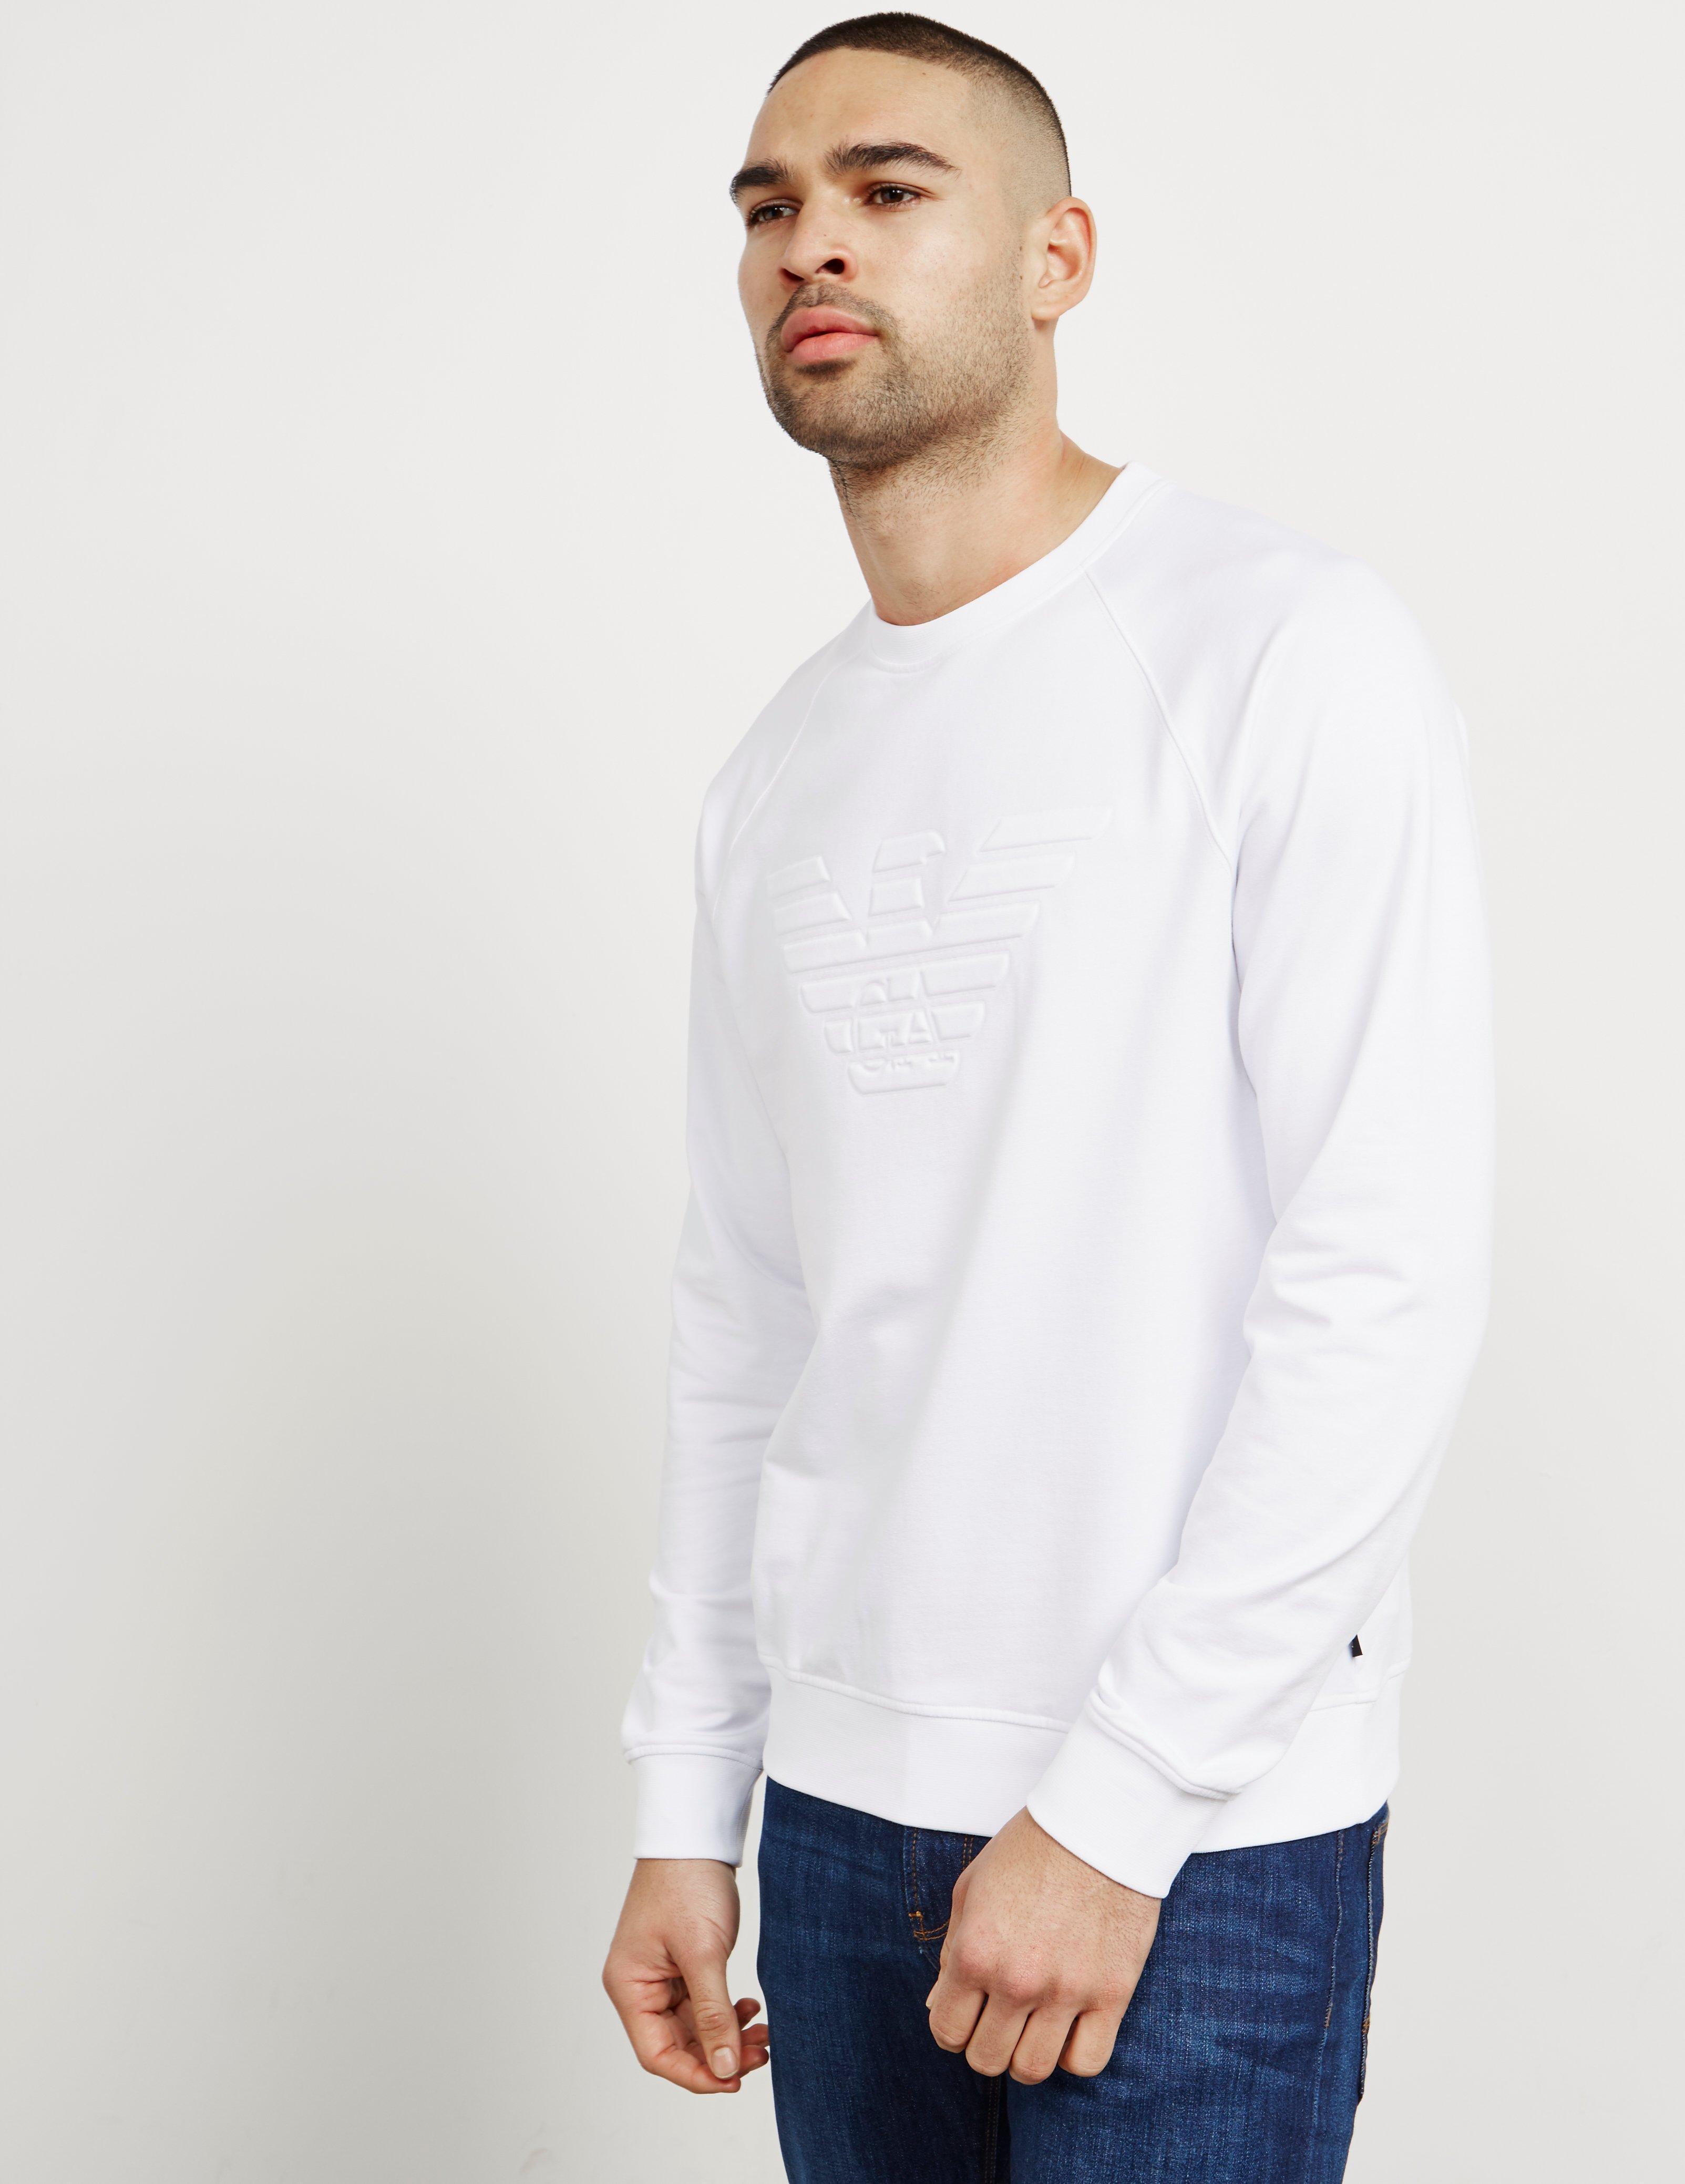 a96b5d5c02 Emporio Armani Embossed Eagle Sweatshirt White for men